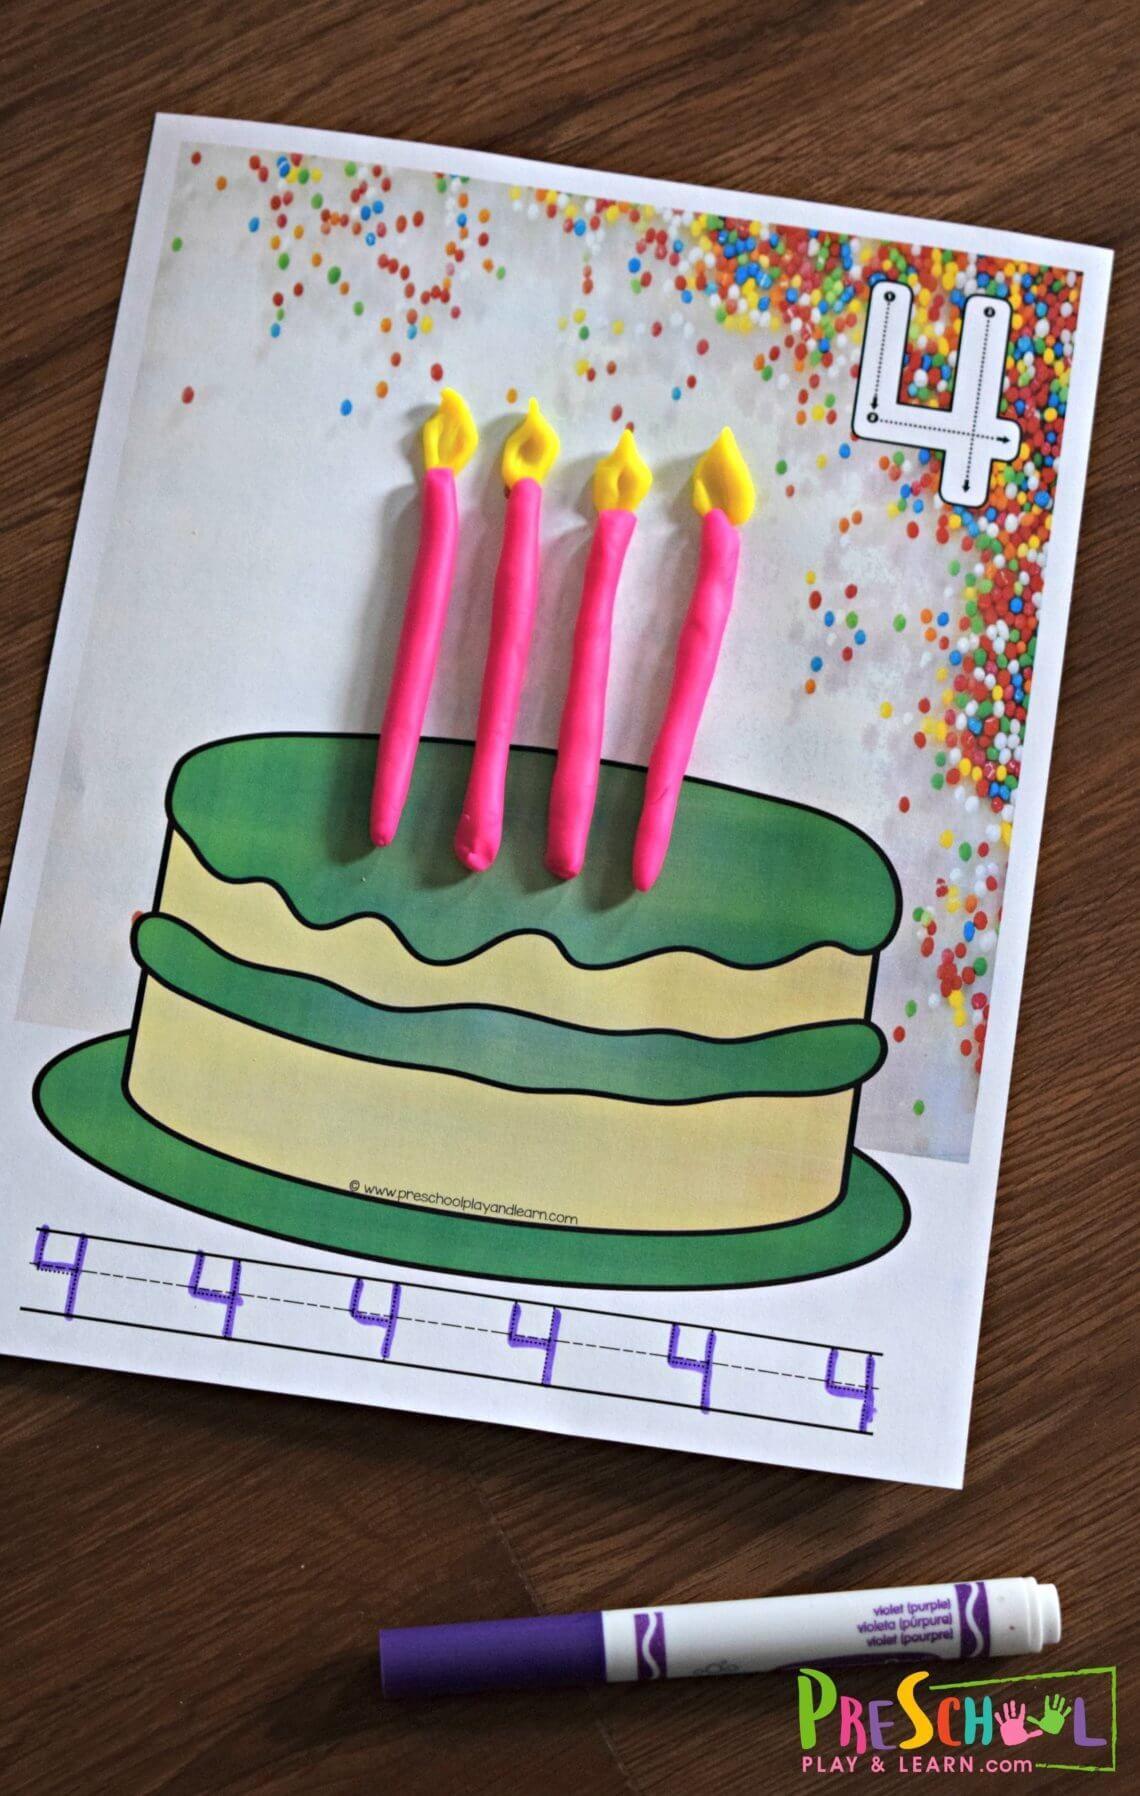 Practice Tracing Numbers 1 10 With These Free Printable Birthday Candle Playdough Alphabet Activities Preschool Kids Math Worksheets Math Activities Preschool [ 1796 x 1140 Pixel ]